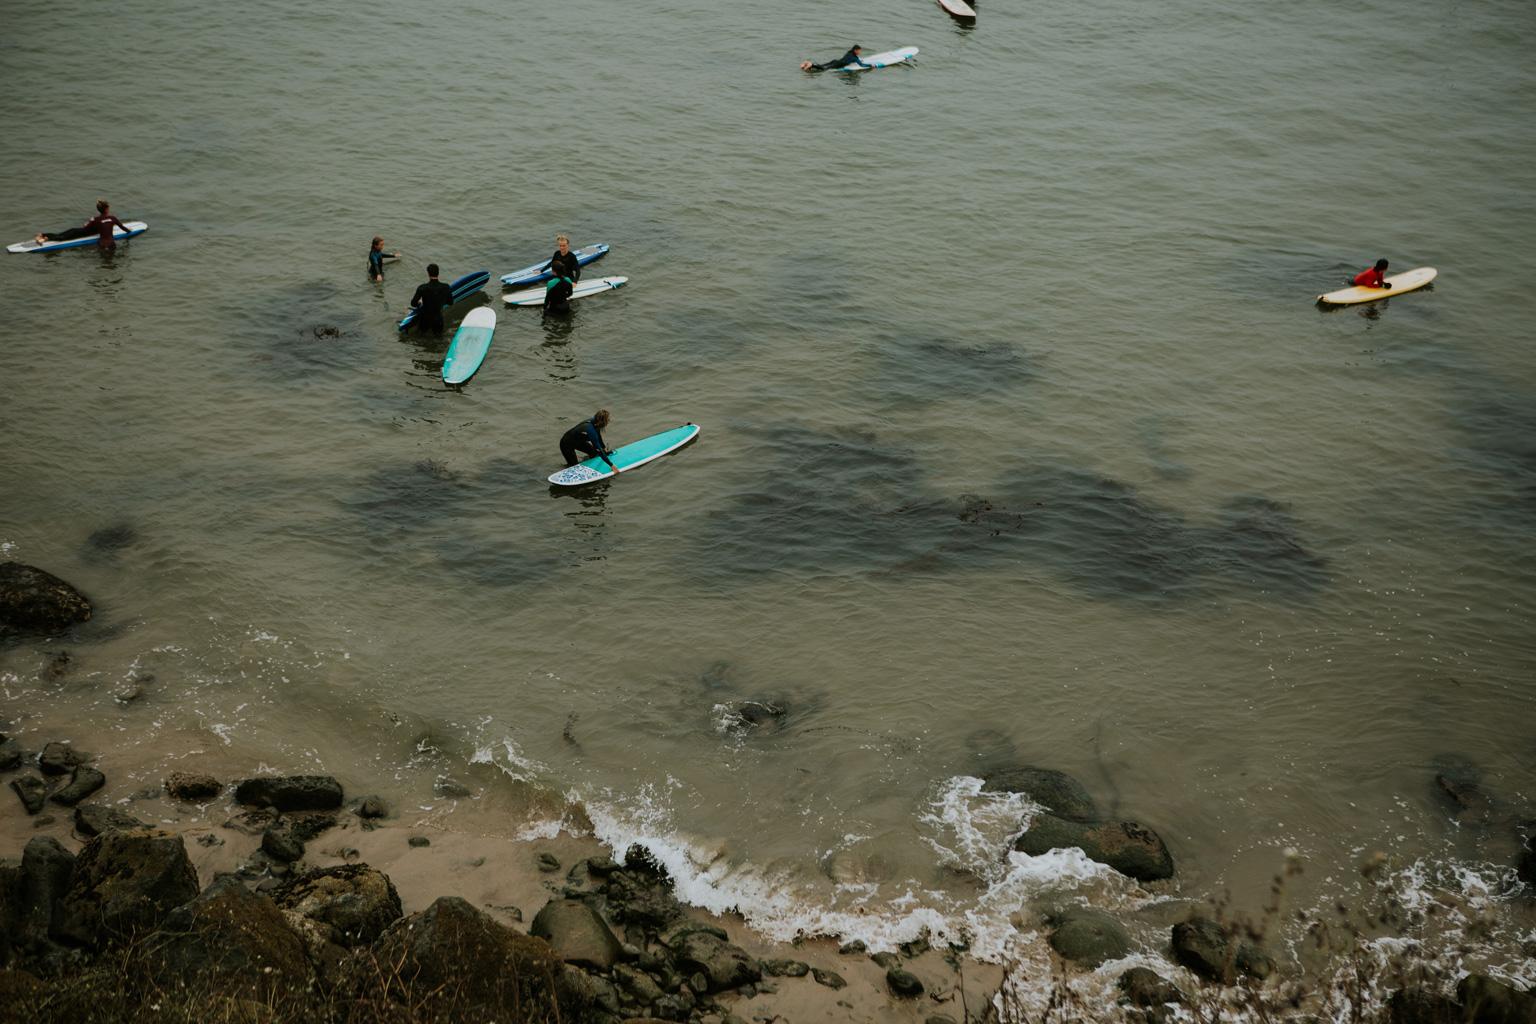 CindyGiovagnoli_SantCruz_SanJose_SanFrancisco_NelderGrove_sea_lions_boardwalk_hapas_brewery_sourdough_ocean_half_moon_bay_California-058.jpg